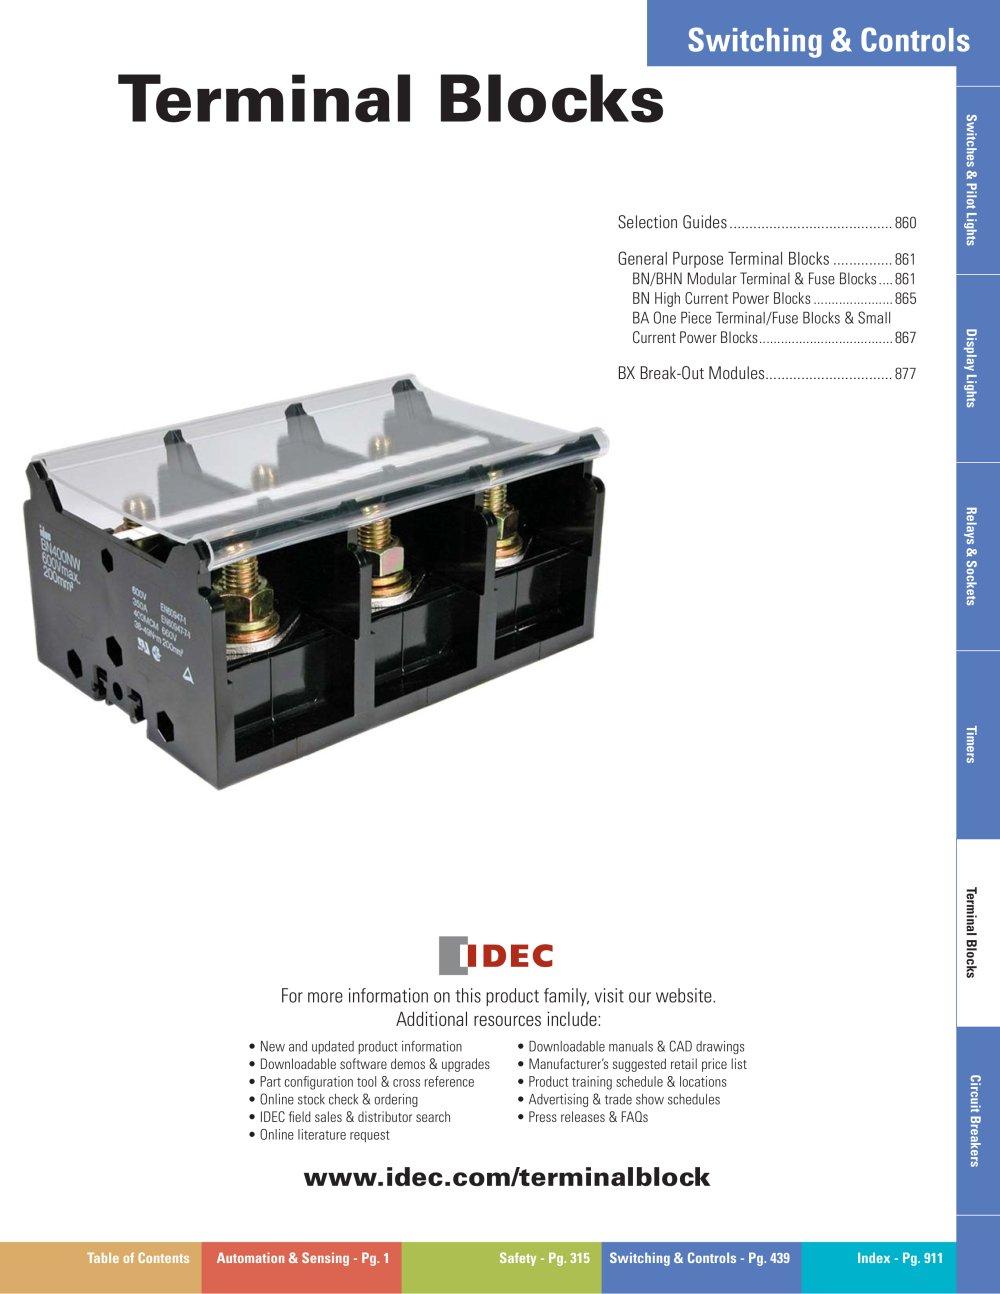 Complete Terminal Blocks Catalog Idec Pdf Catalogs Technical Relay Crimp 1 22 Pages